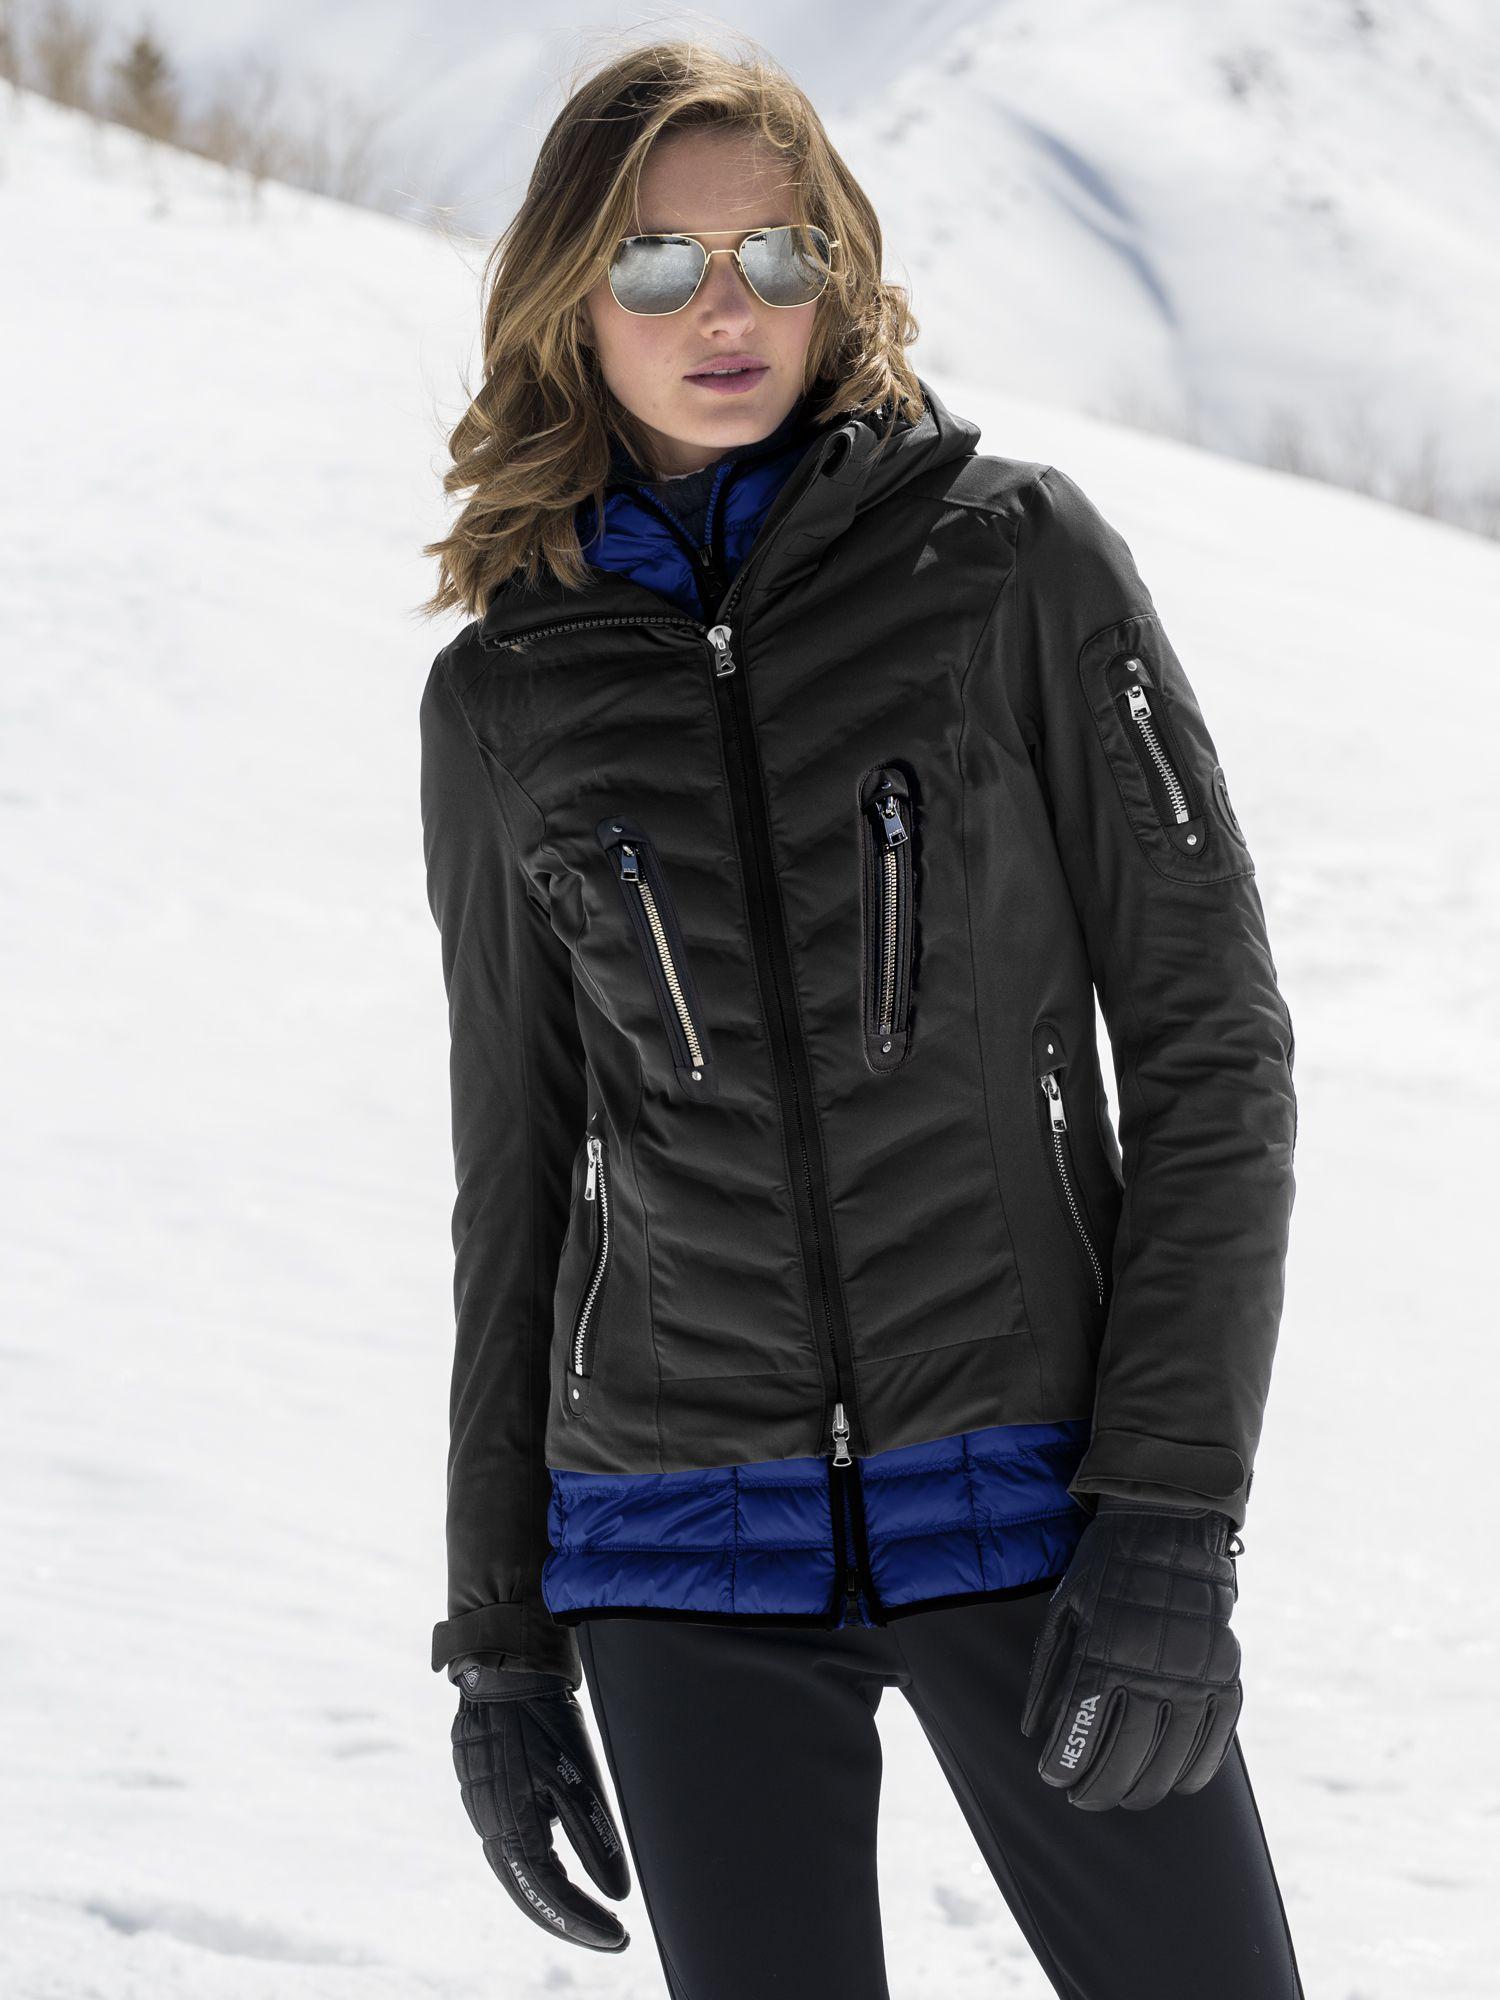 Pin by G on Ski in 2020   Insulated ski jacket, Ski jacket ...